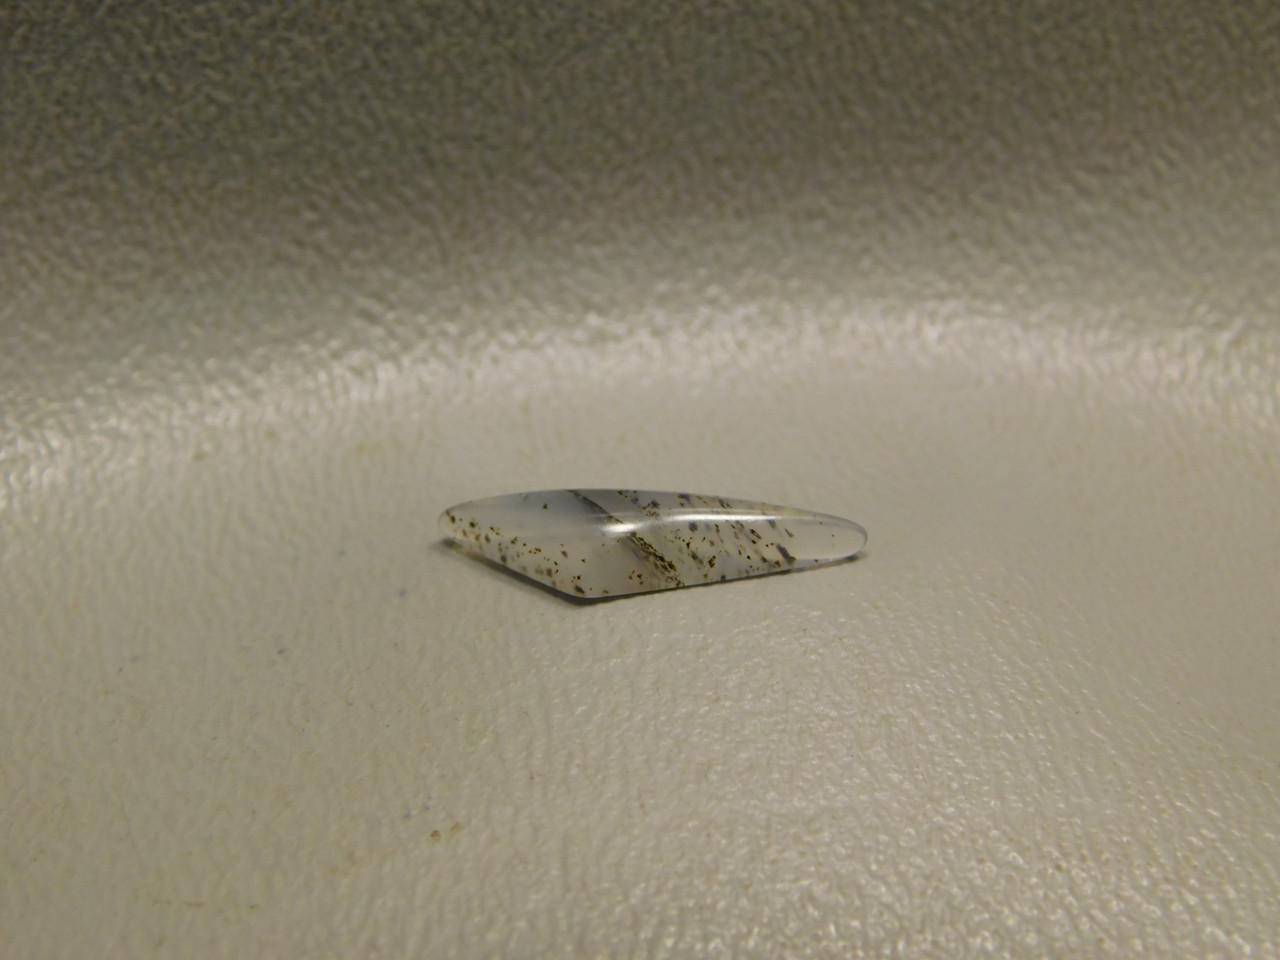 Montana Agate Translucent Small Triangle Cabochon Jewelry Stone #18